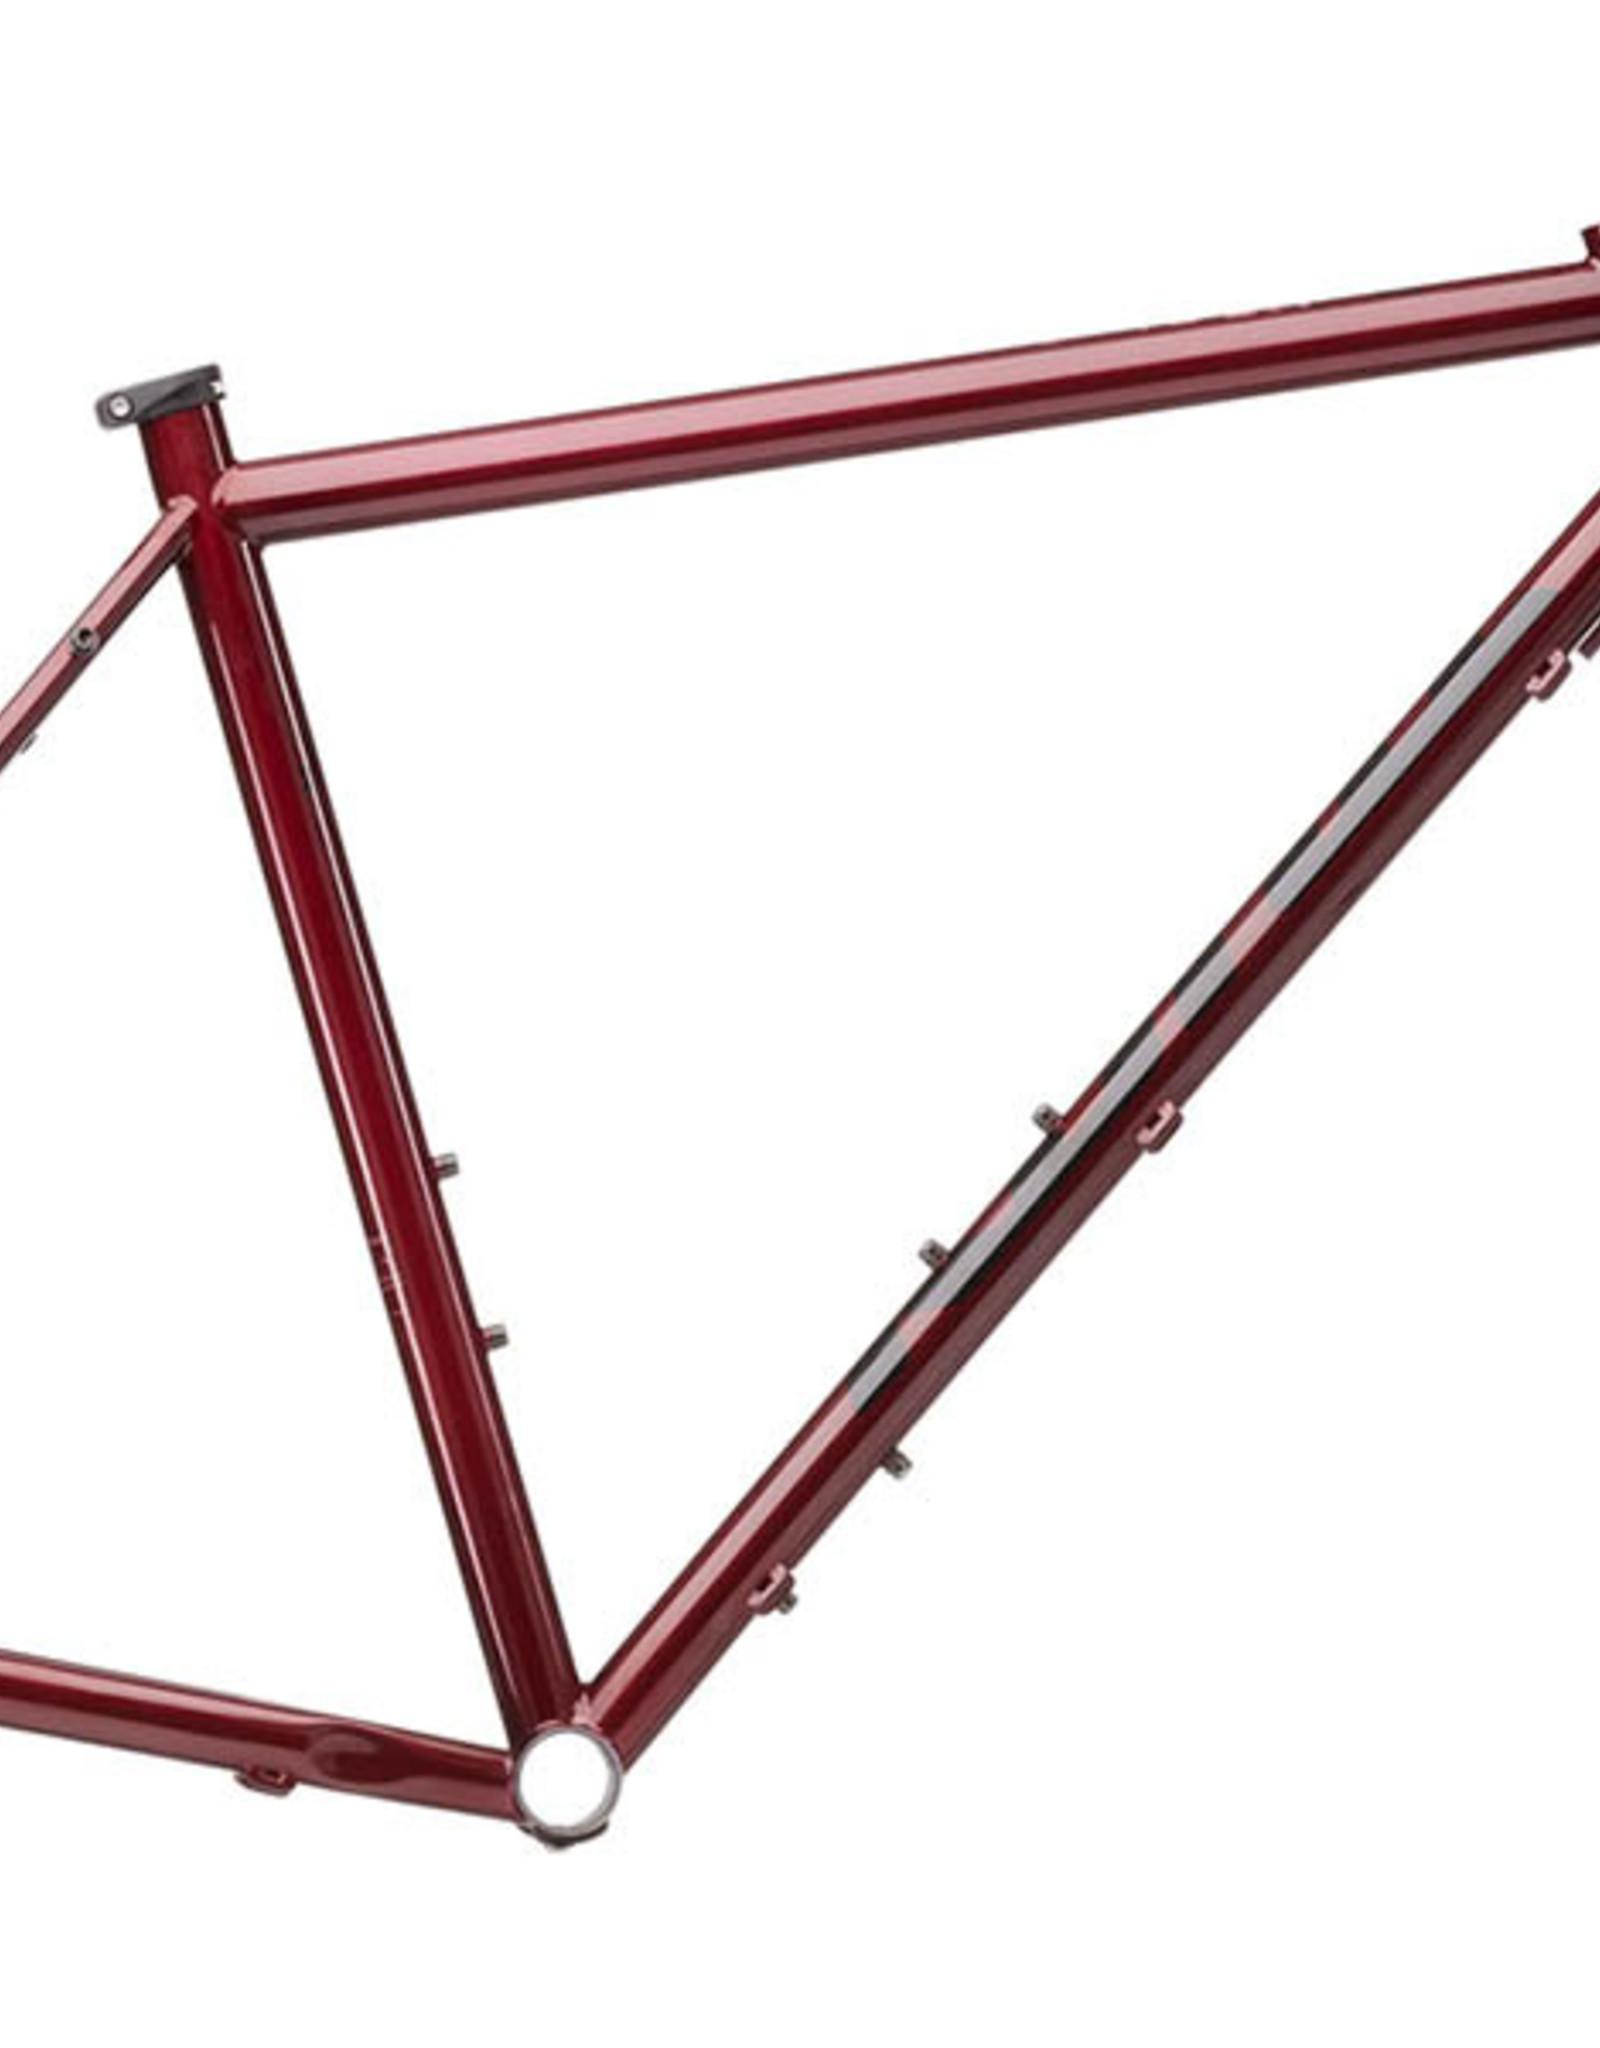 Kona Kona Rove LTD 56cm Frame w/Kona Carbon Rove Fork 2021